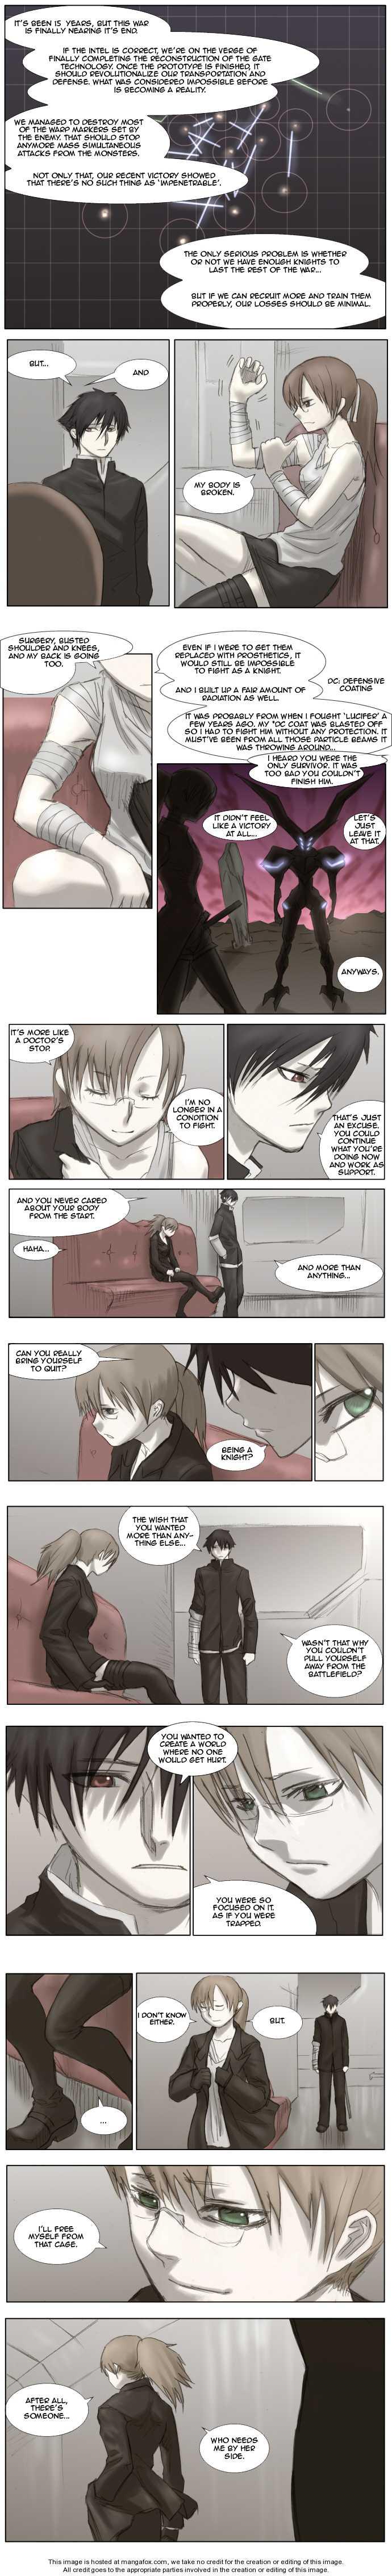 Knight Run 3 Page 3